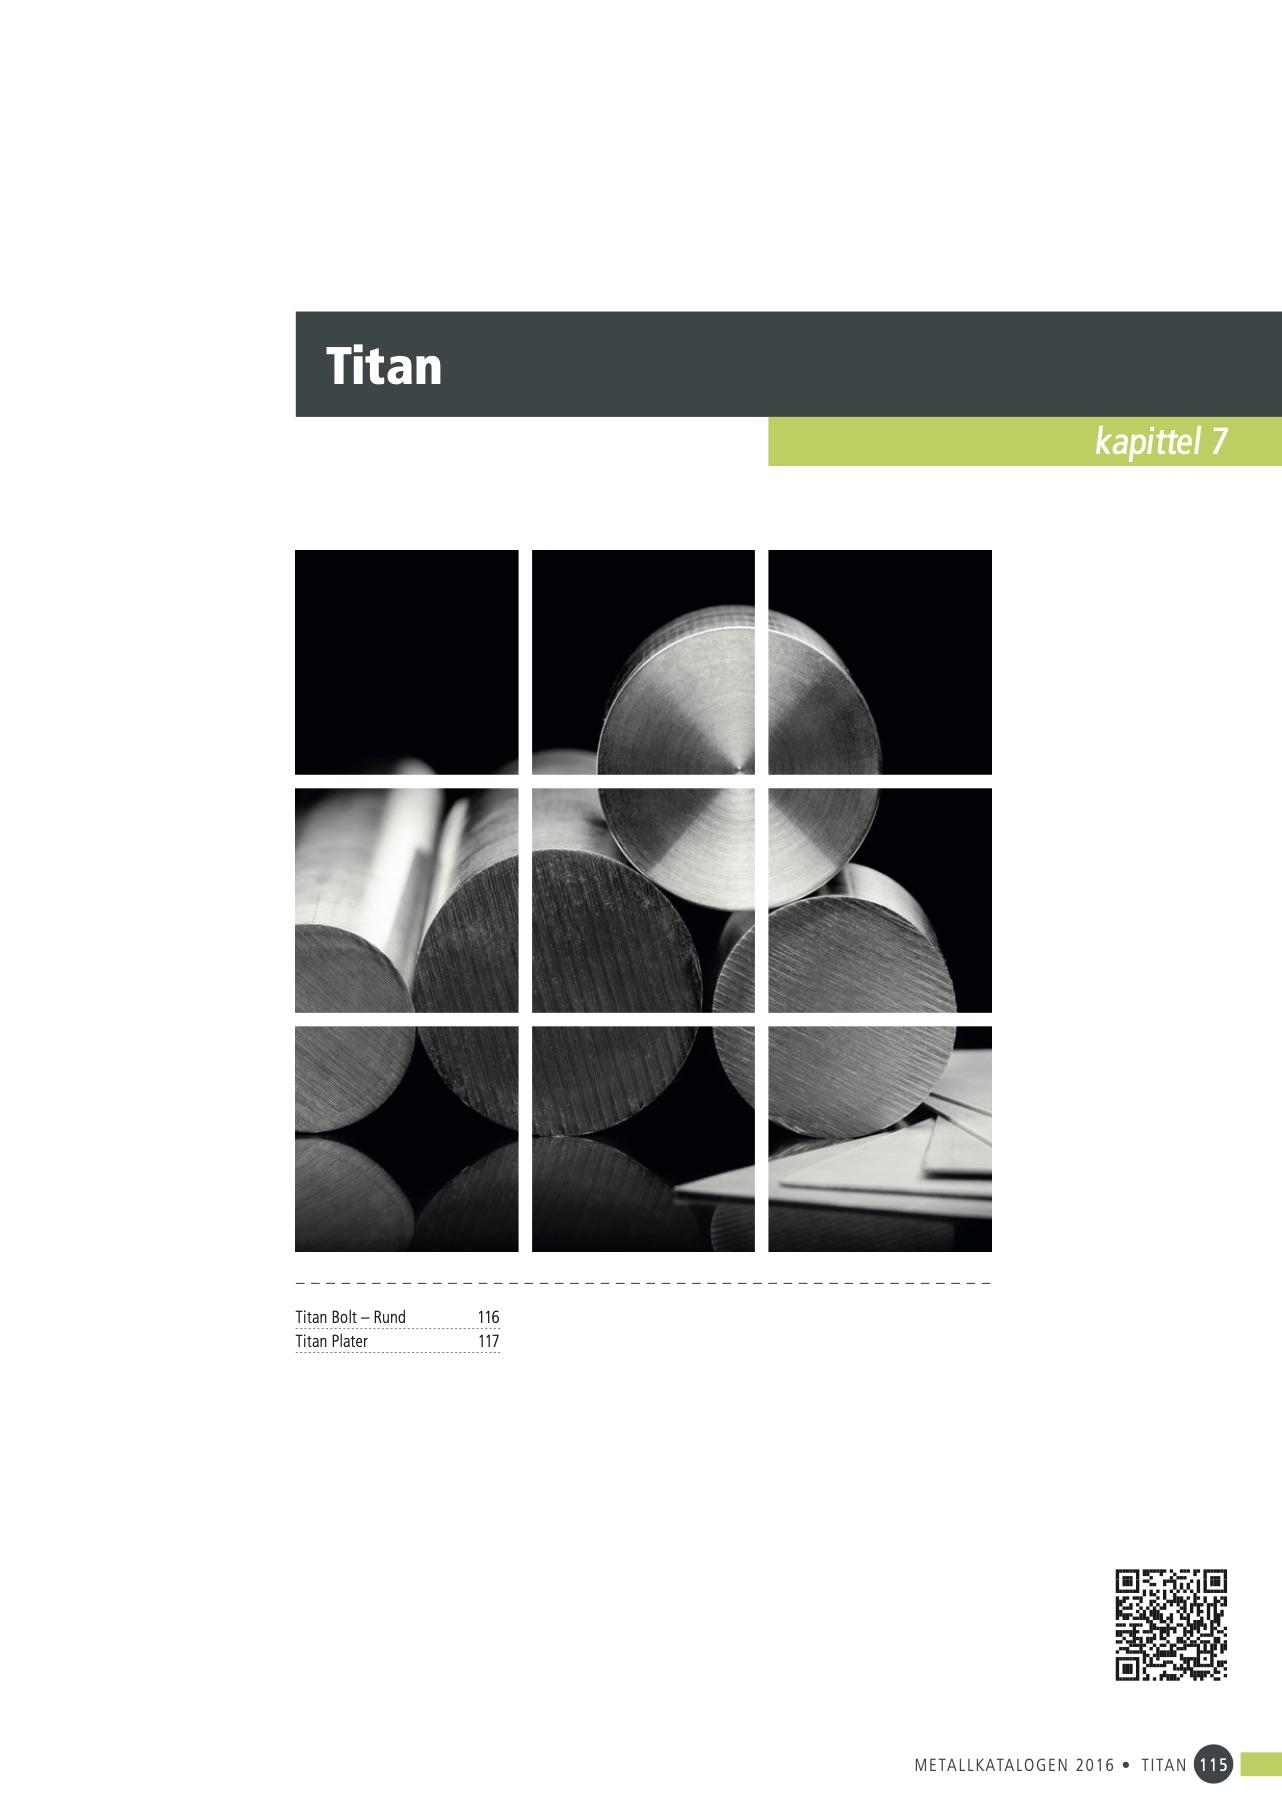 07 Titan